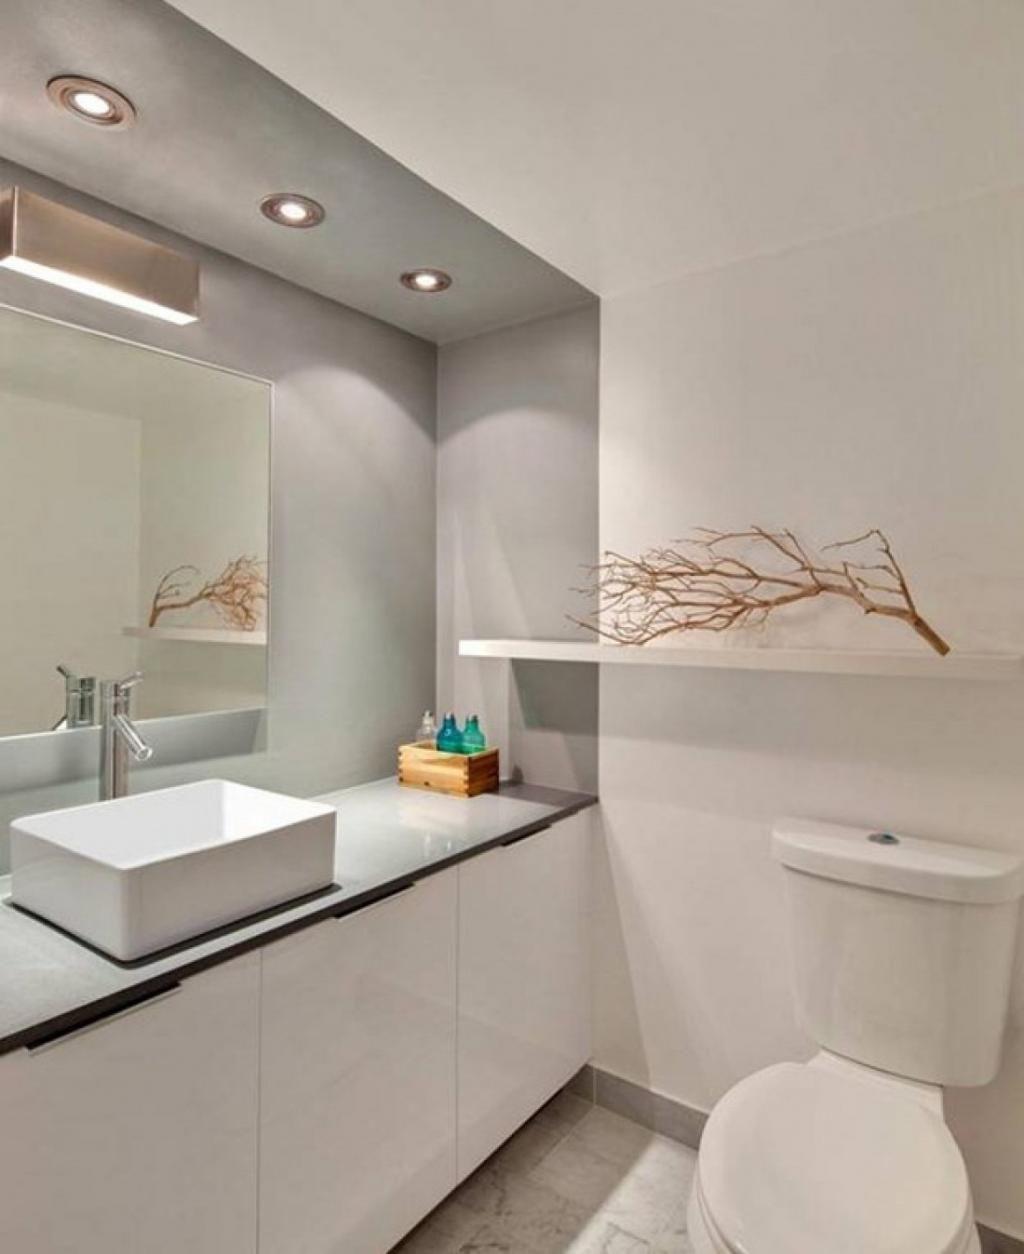 Apartment Bathroom Designs Interesting Modern Bathroom Design Ideas  Modern Apartment Bathroom Designs Inspiration Design